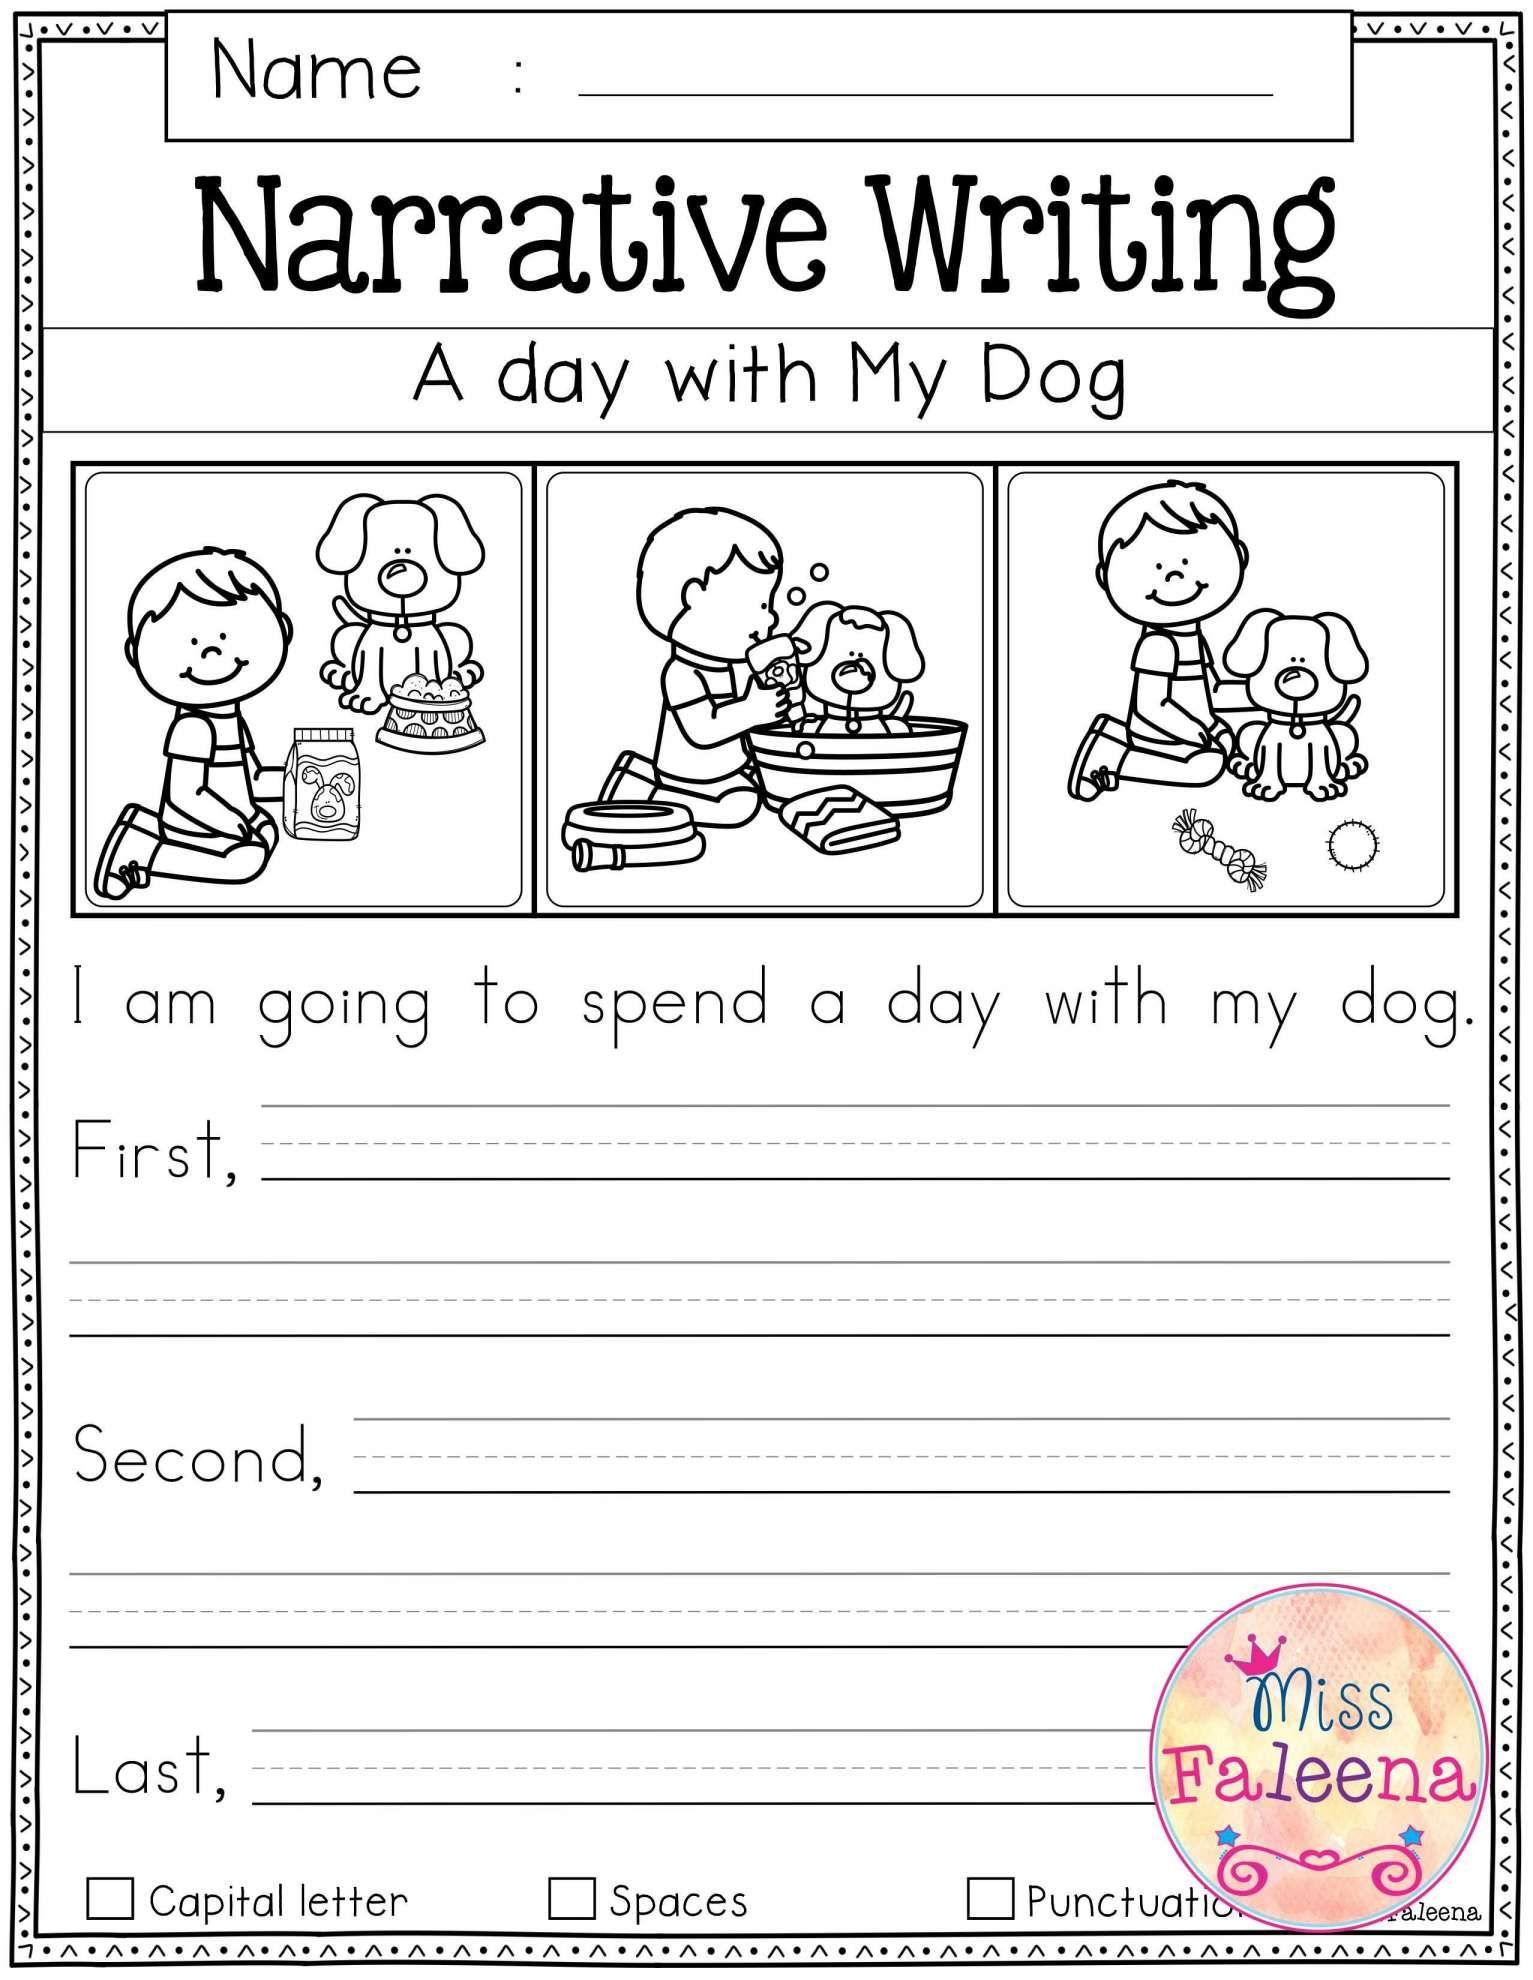 11 1st Grade Writing Prompts Worksheet 1st Grade Writing Prompts Writing Prompts For Kids First Grade Writing [ 1980 x 1533 Pixel ]